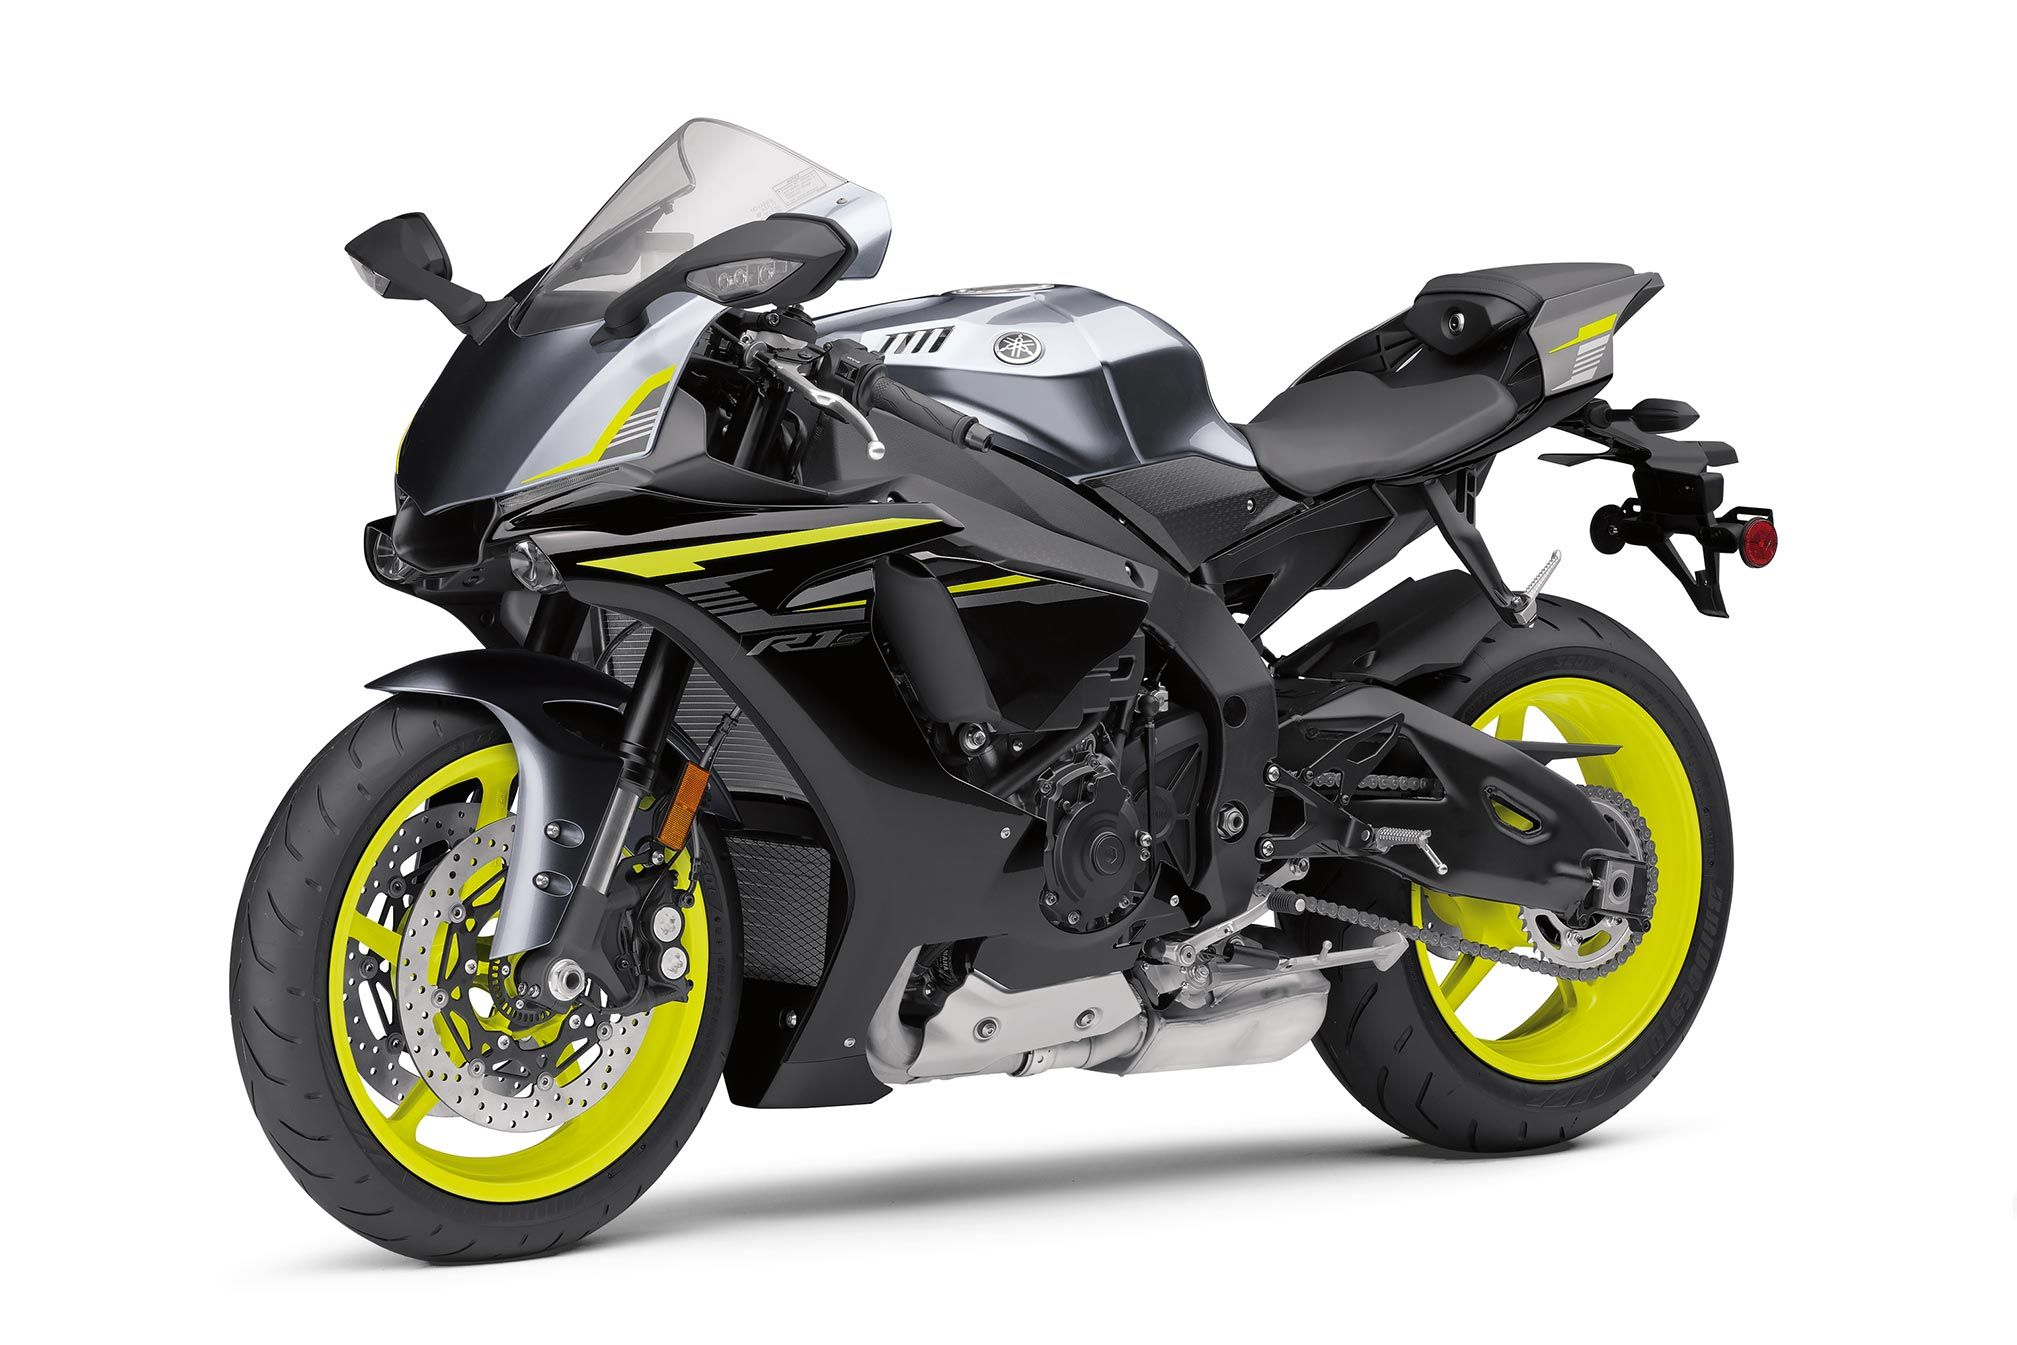 2017 Yamaha YZF R1S5 2017—1345